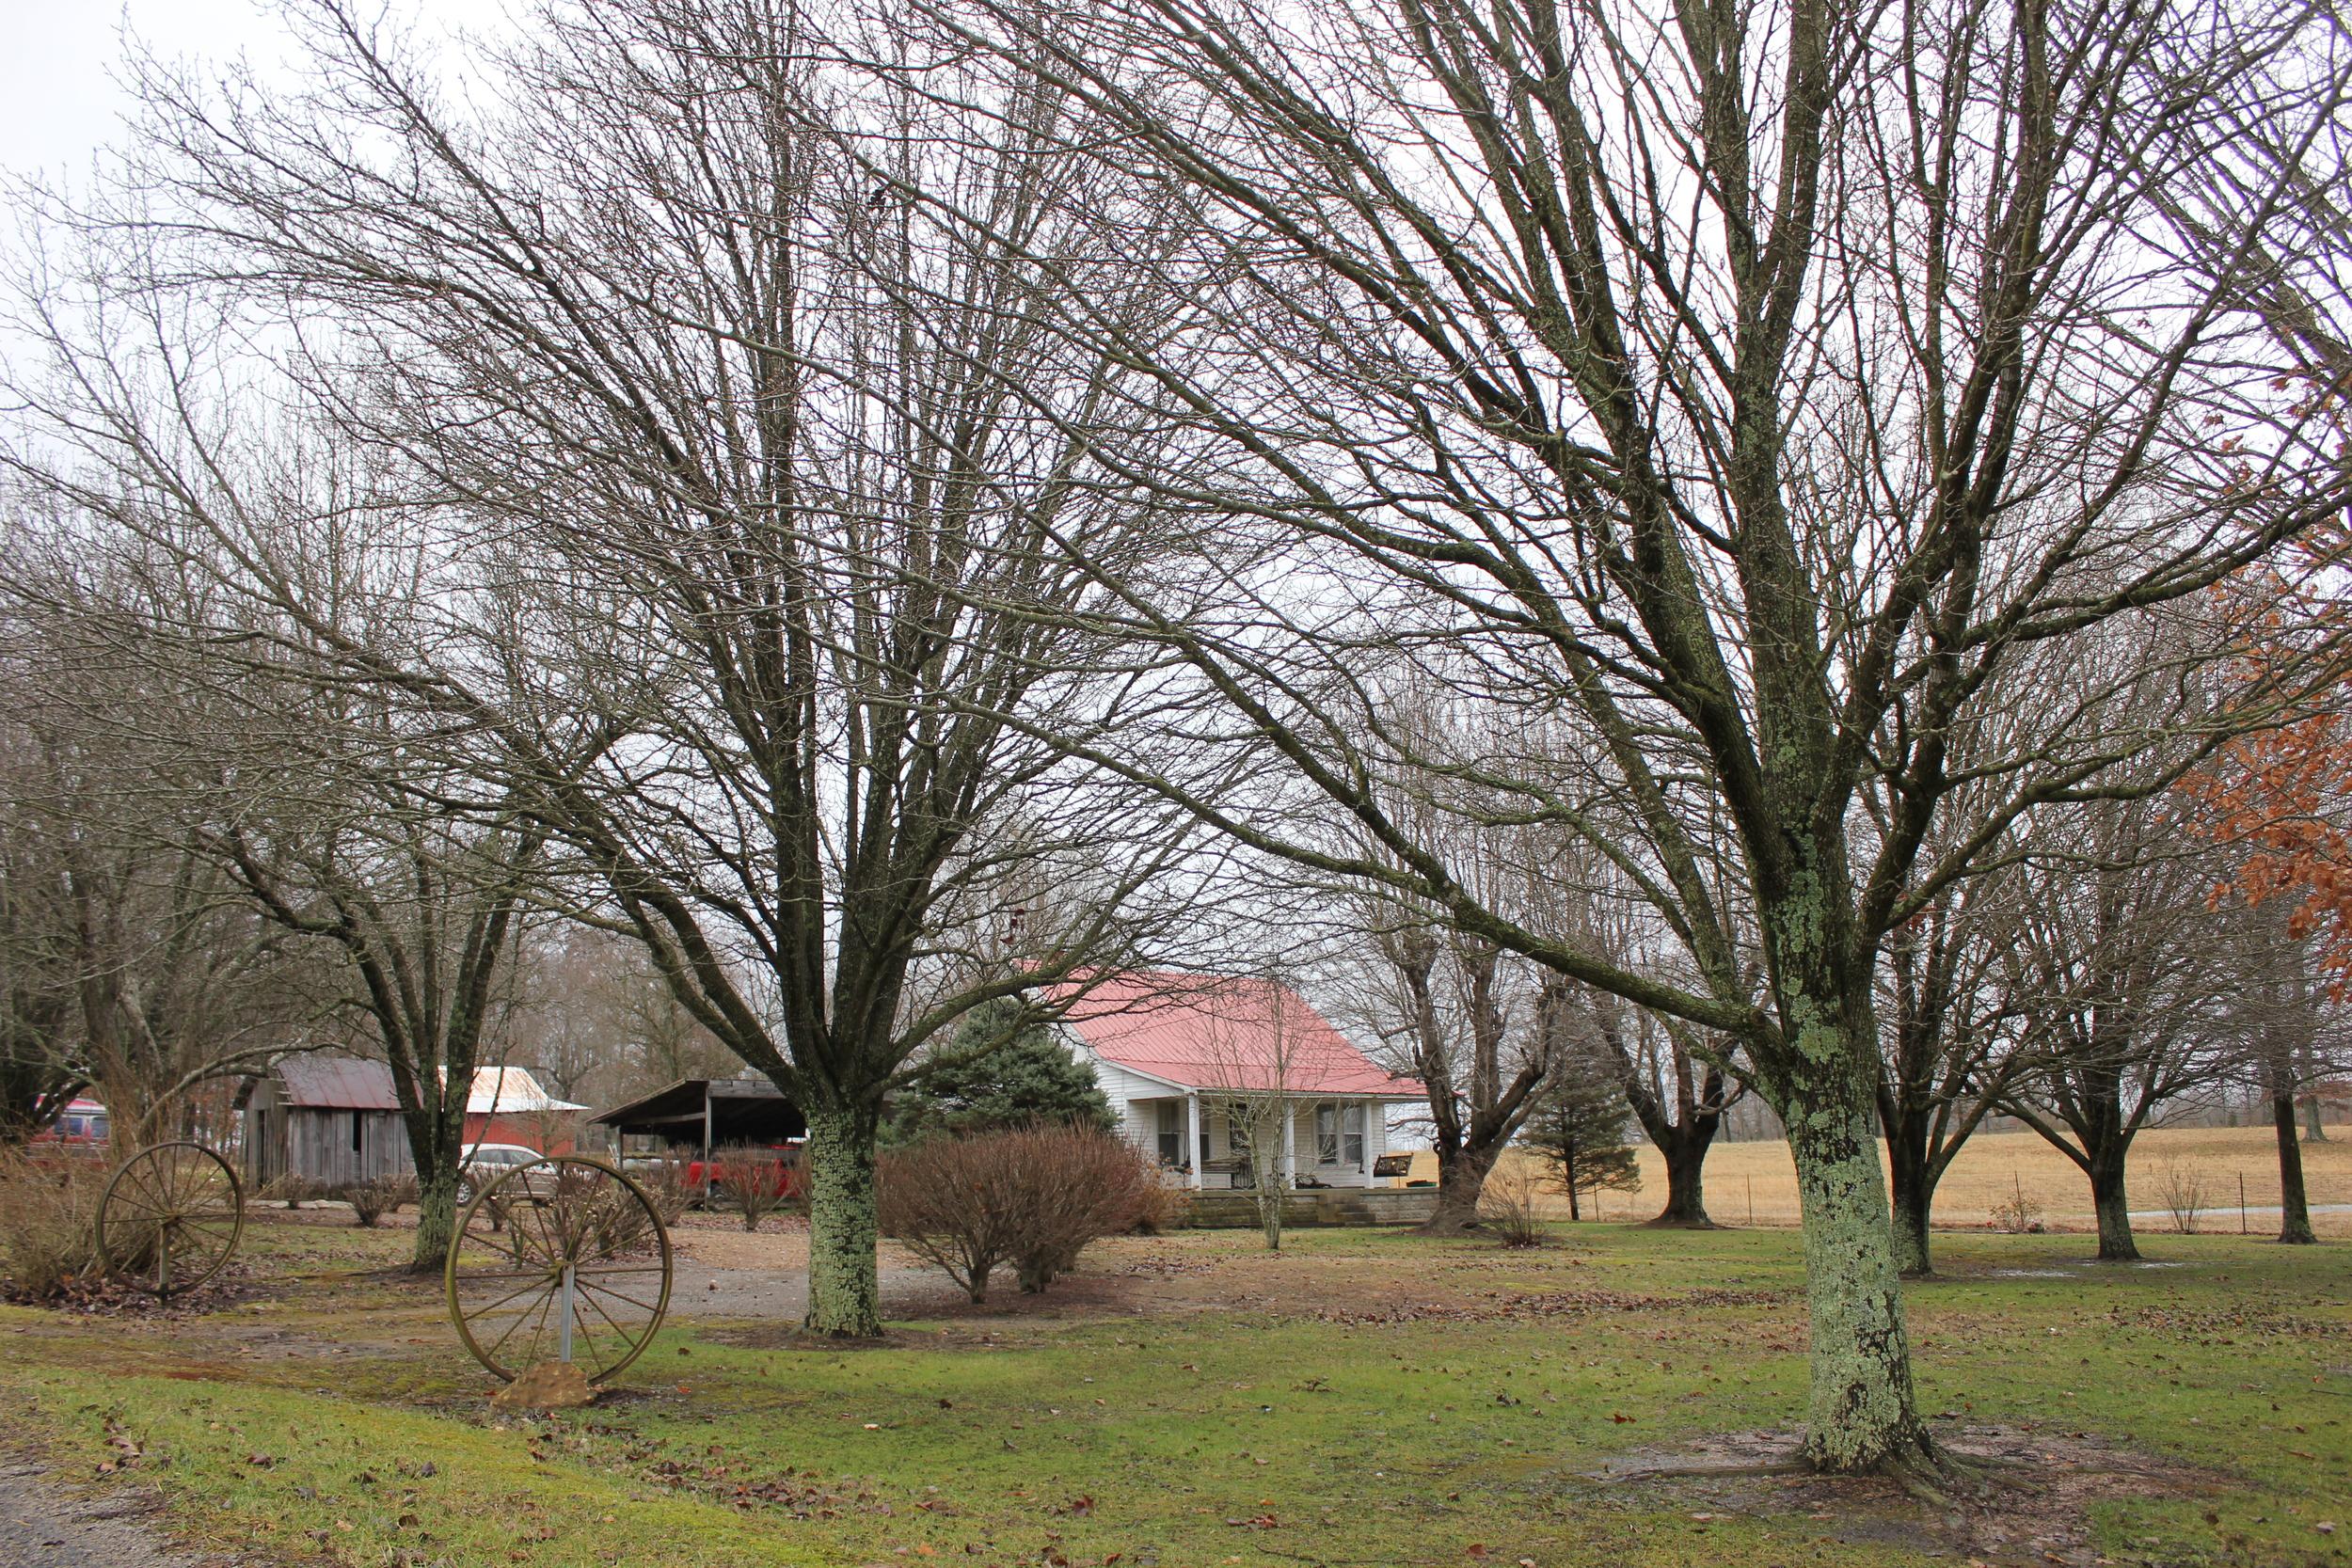 The family farm.